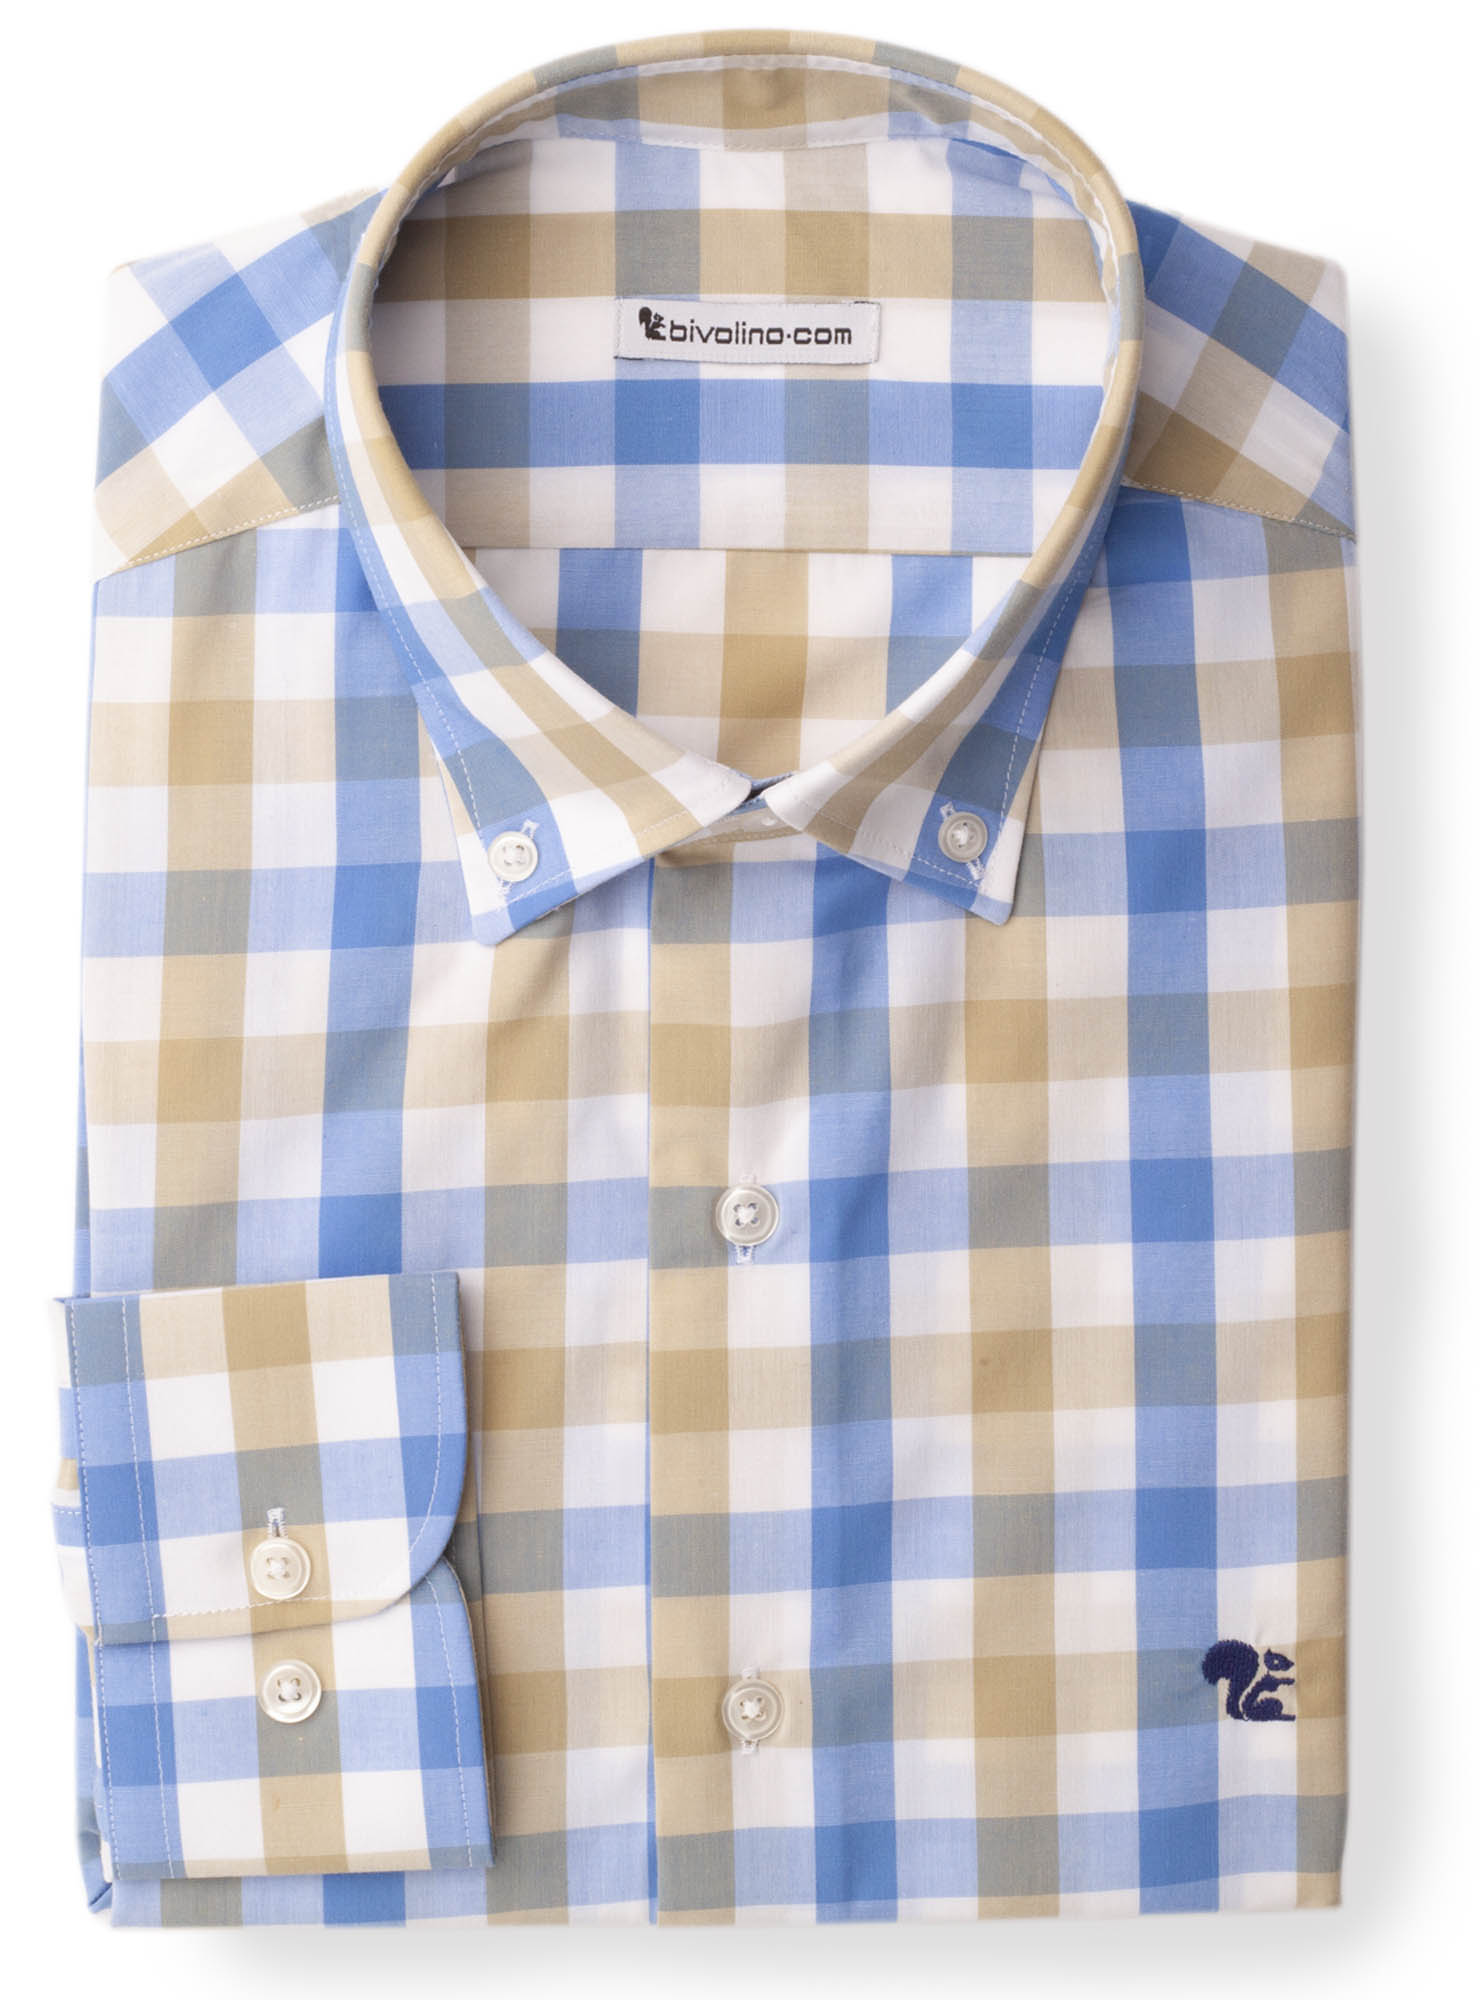 LADOBORA - madras ruit navy popeline overhemd - LADO 1